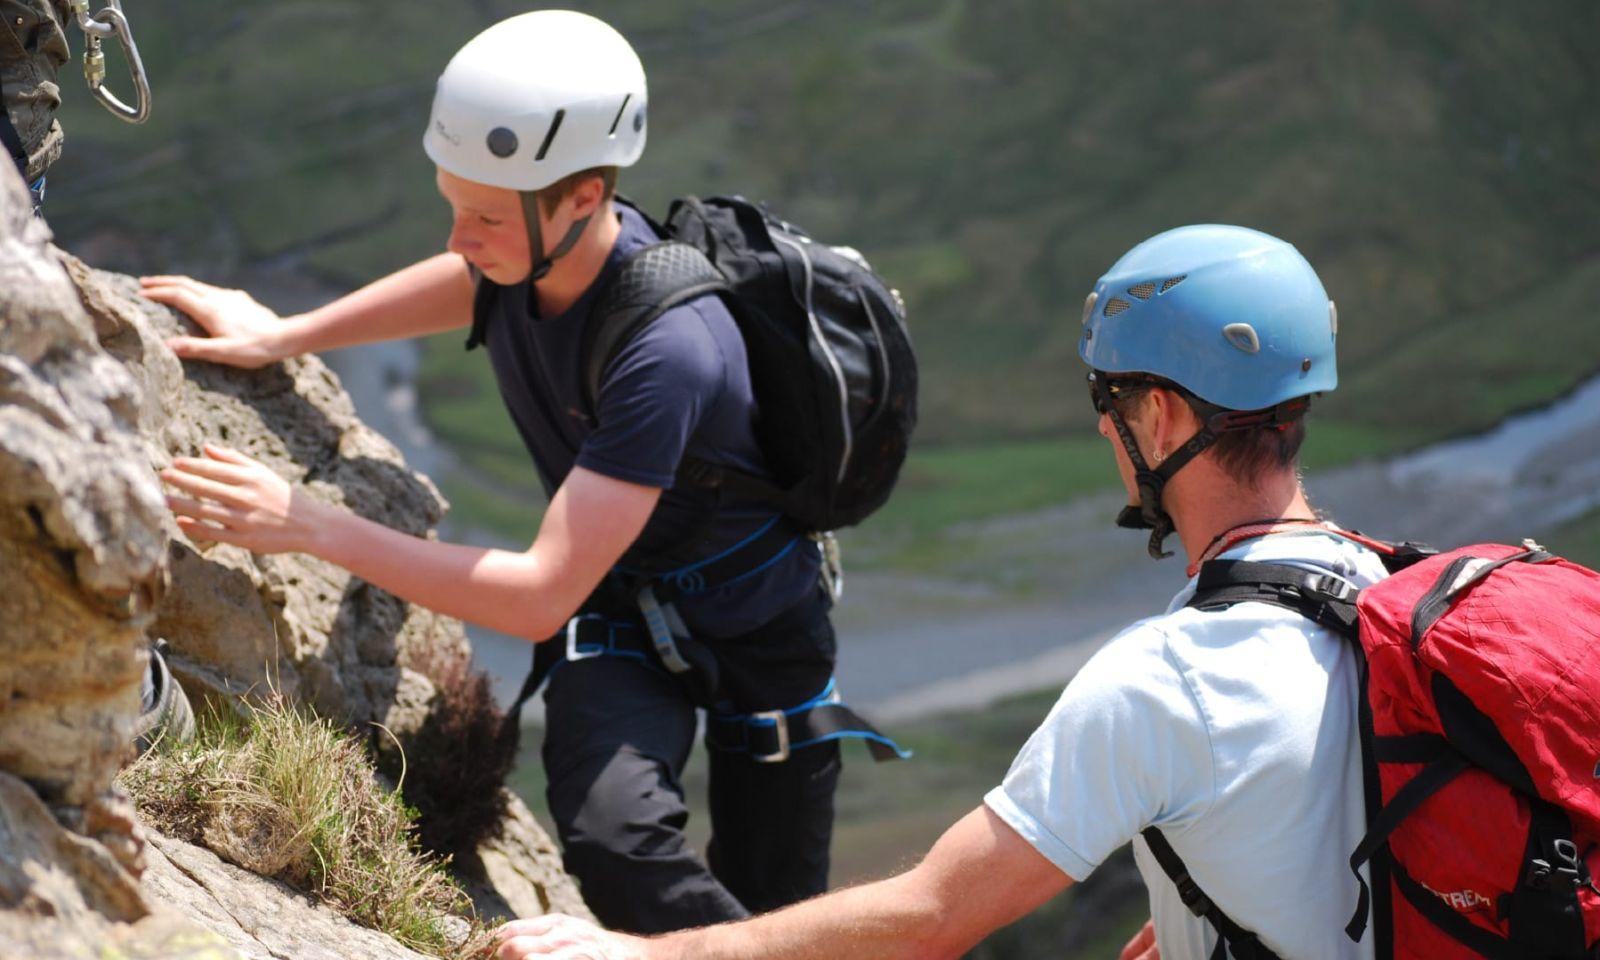 Young boy and an instructor enjoying climbing.